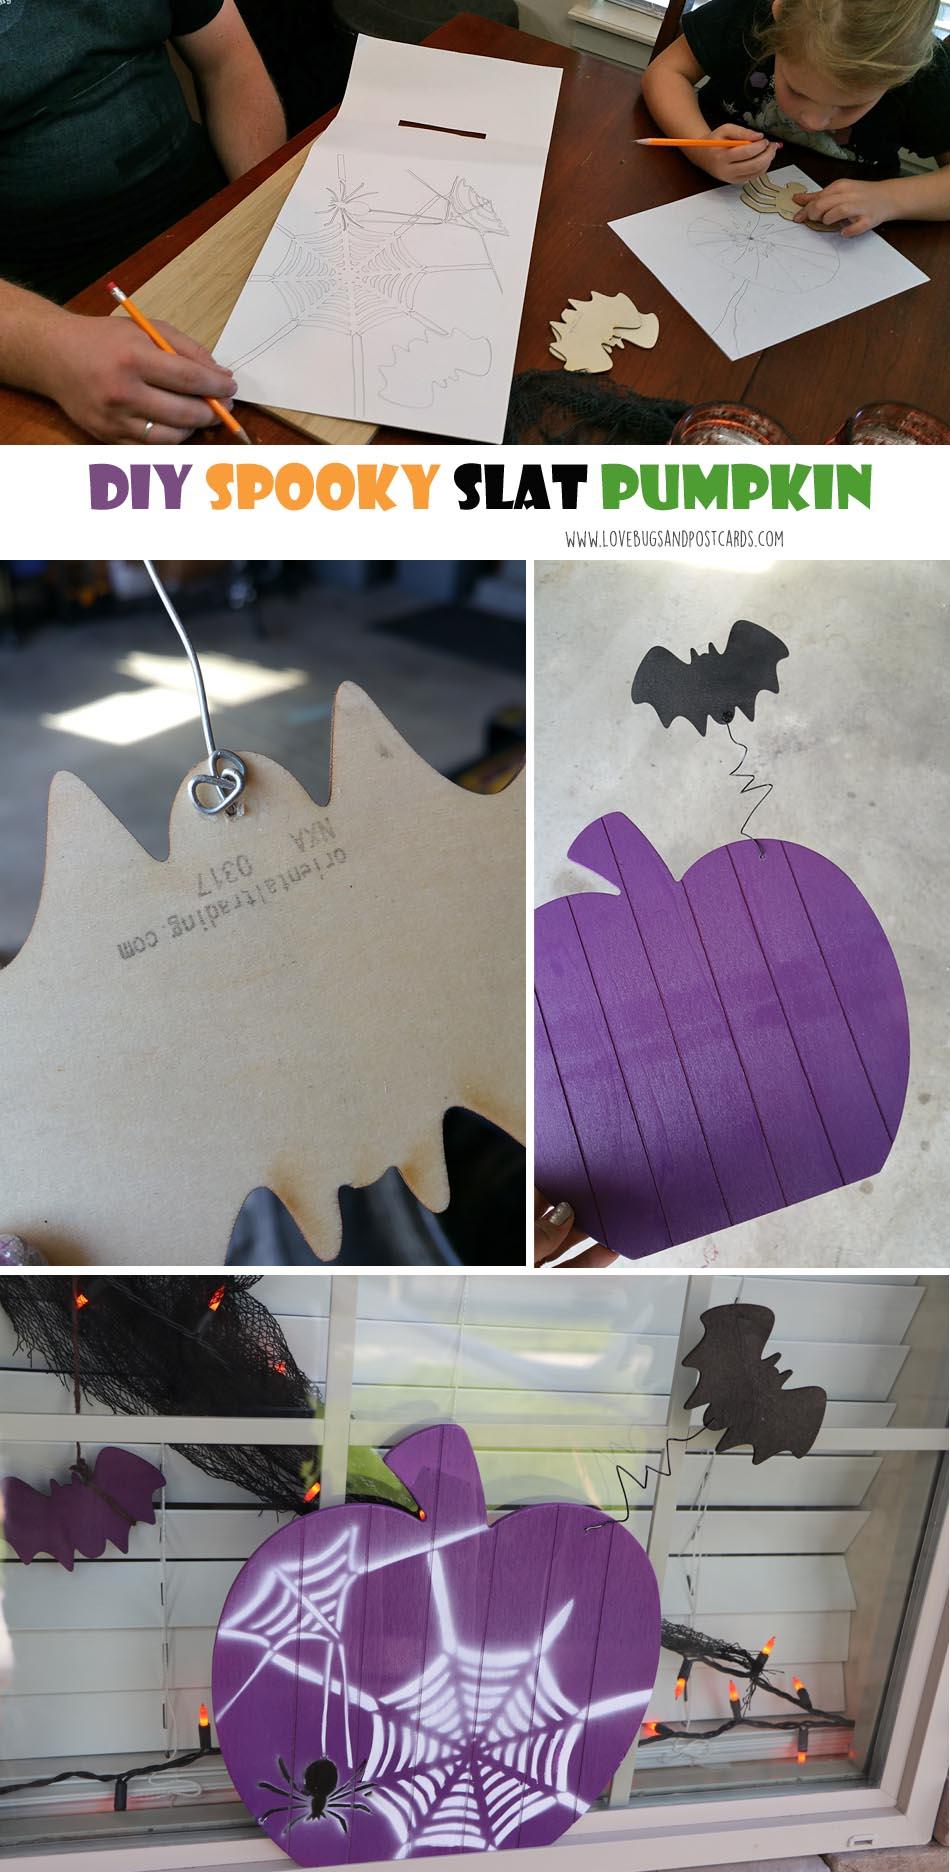 DIY Spooky Halloween Slat Pumpkin